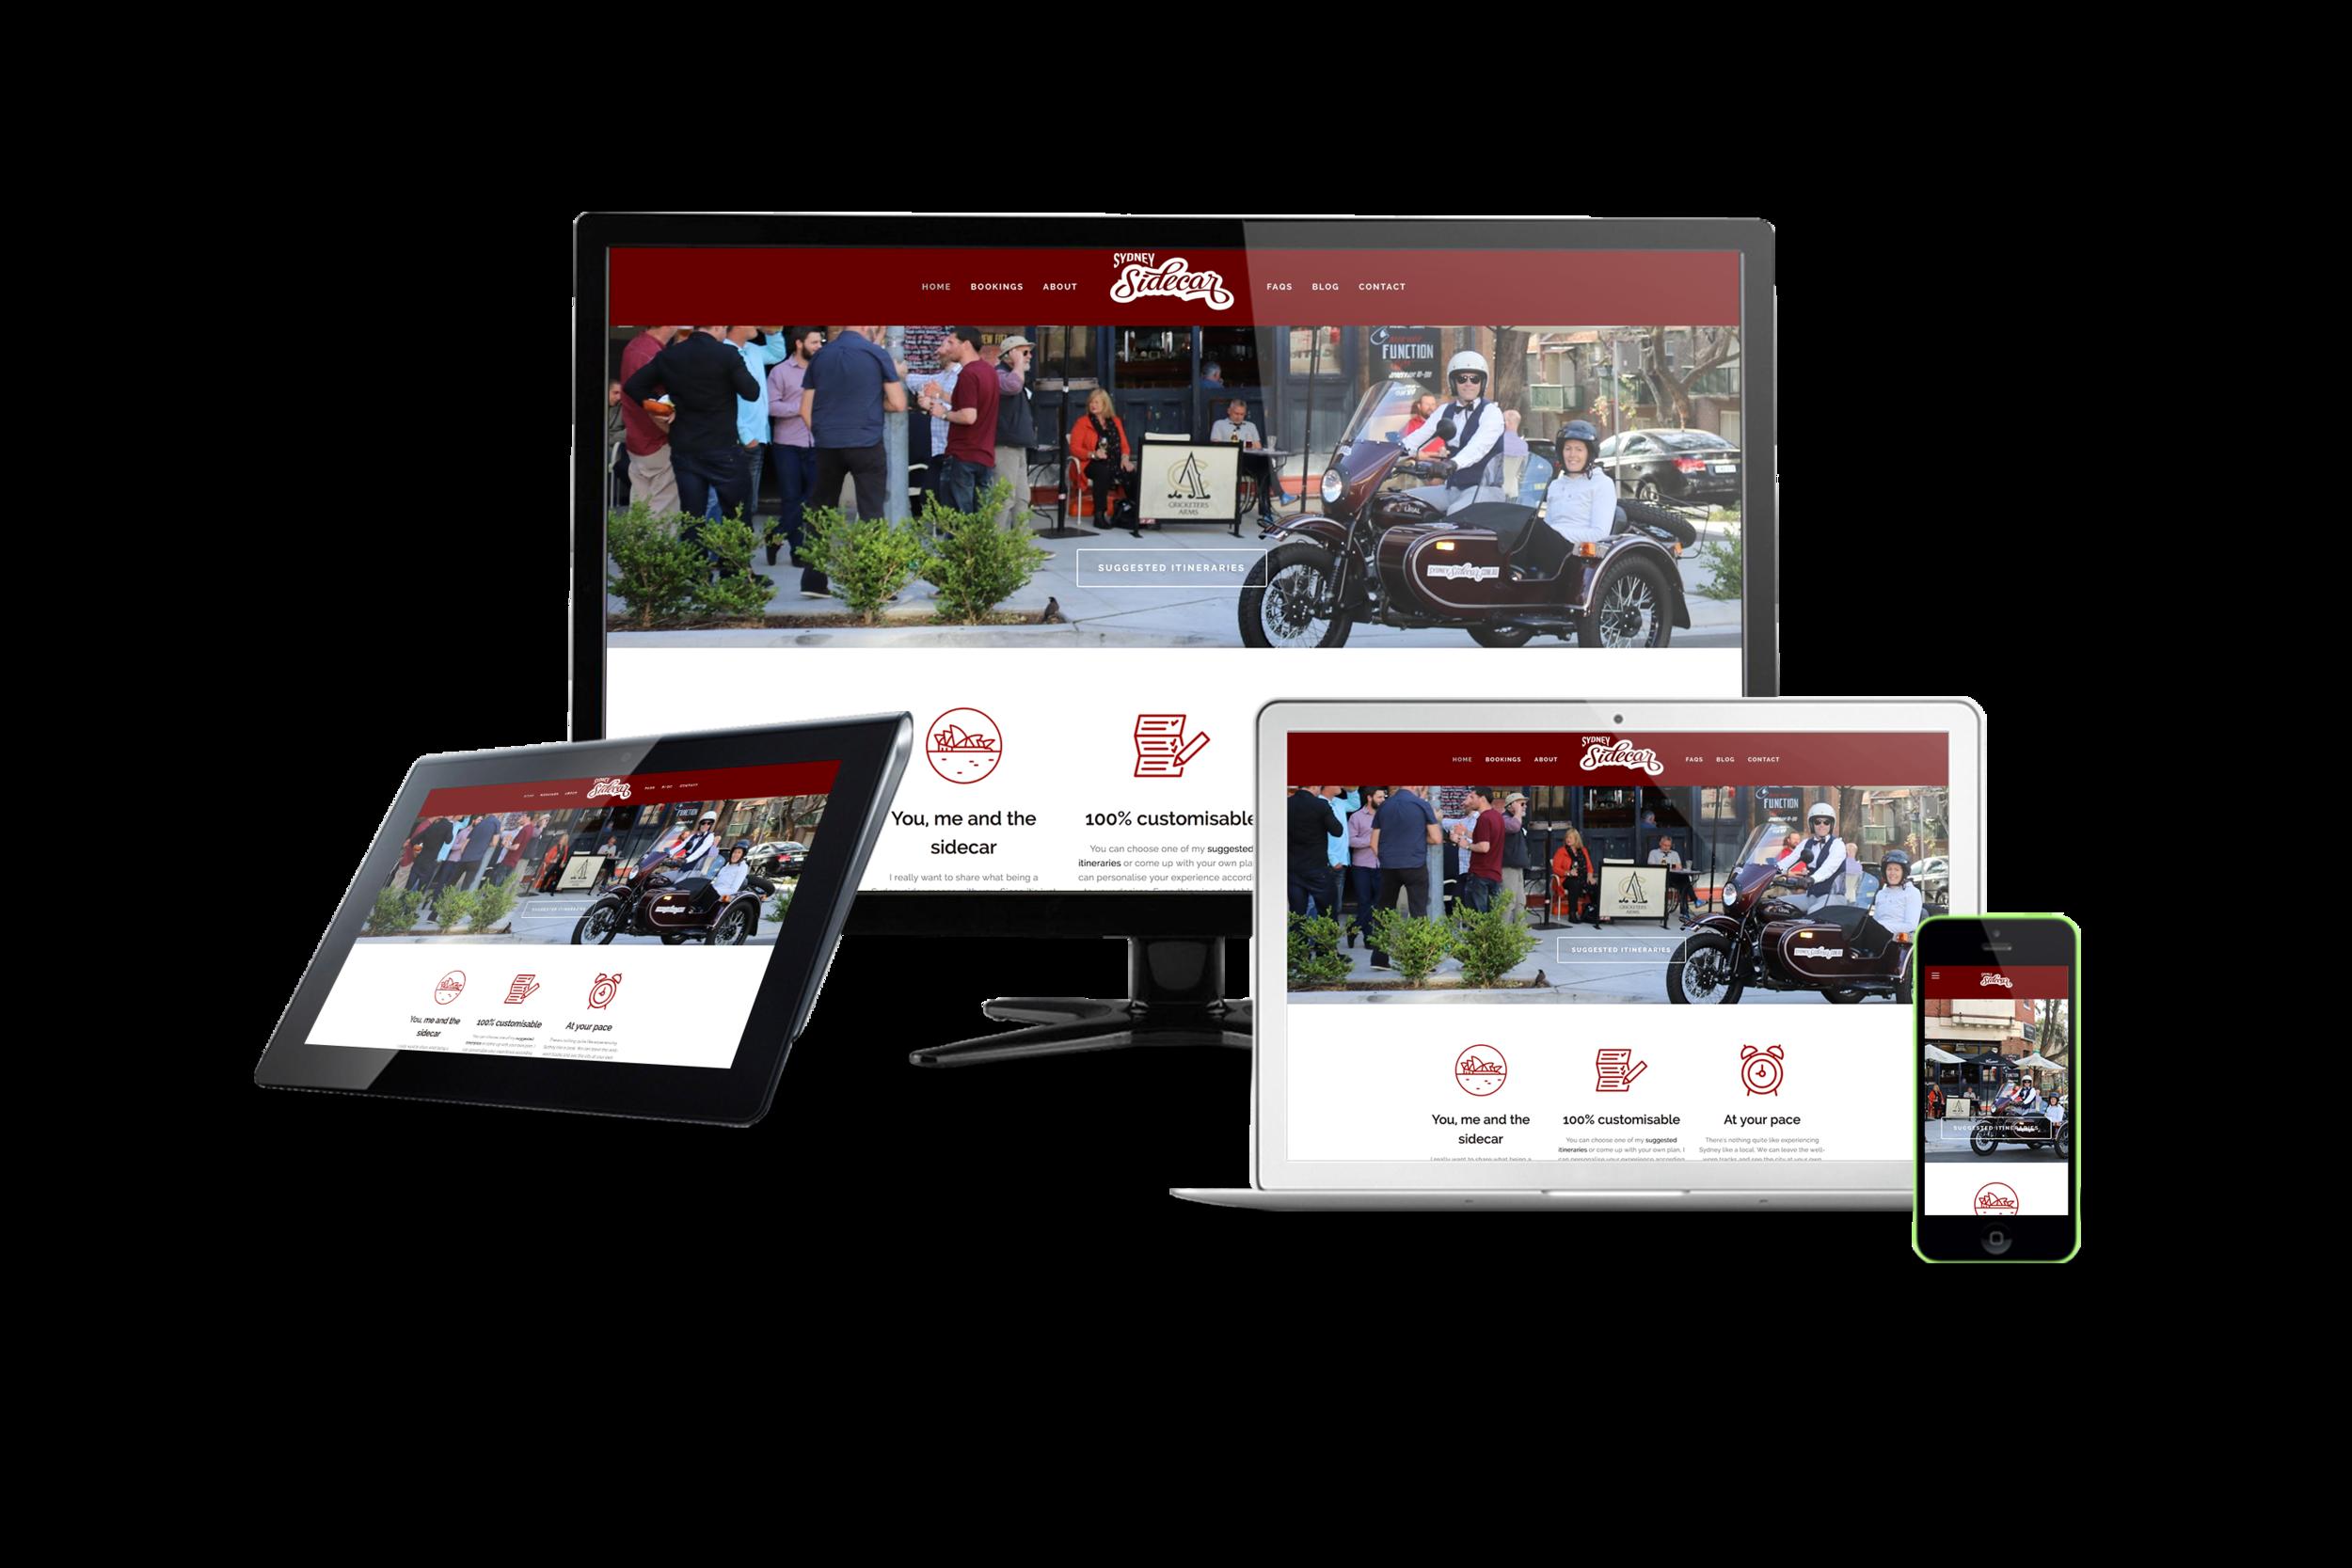 sydney-sidecar-case-study-staart-digital.png